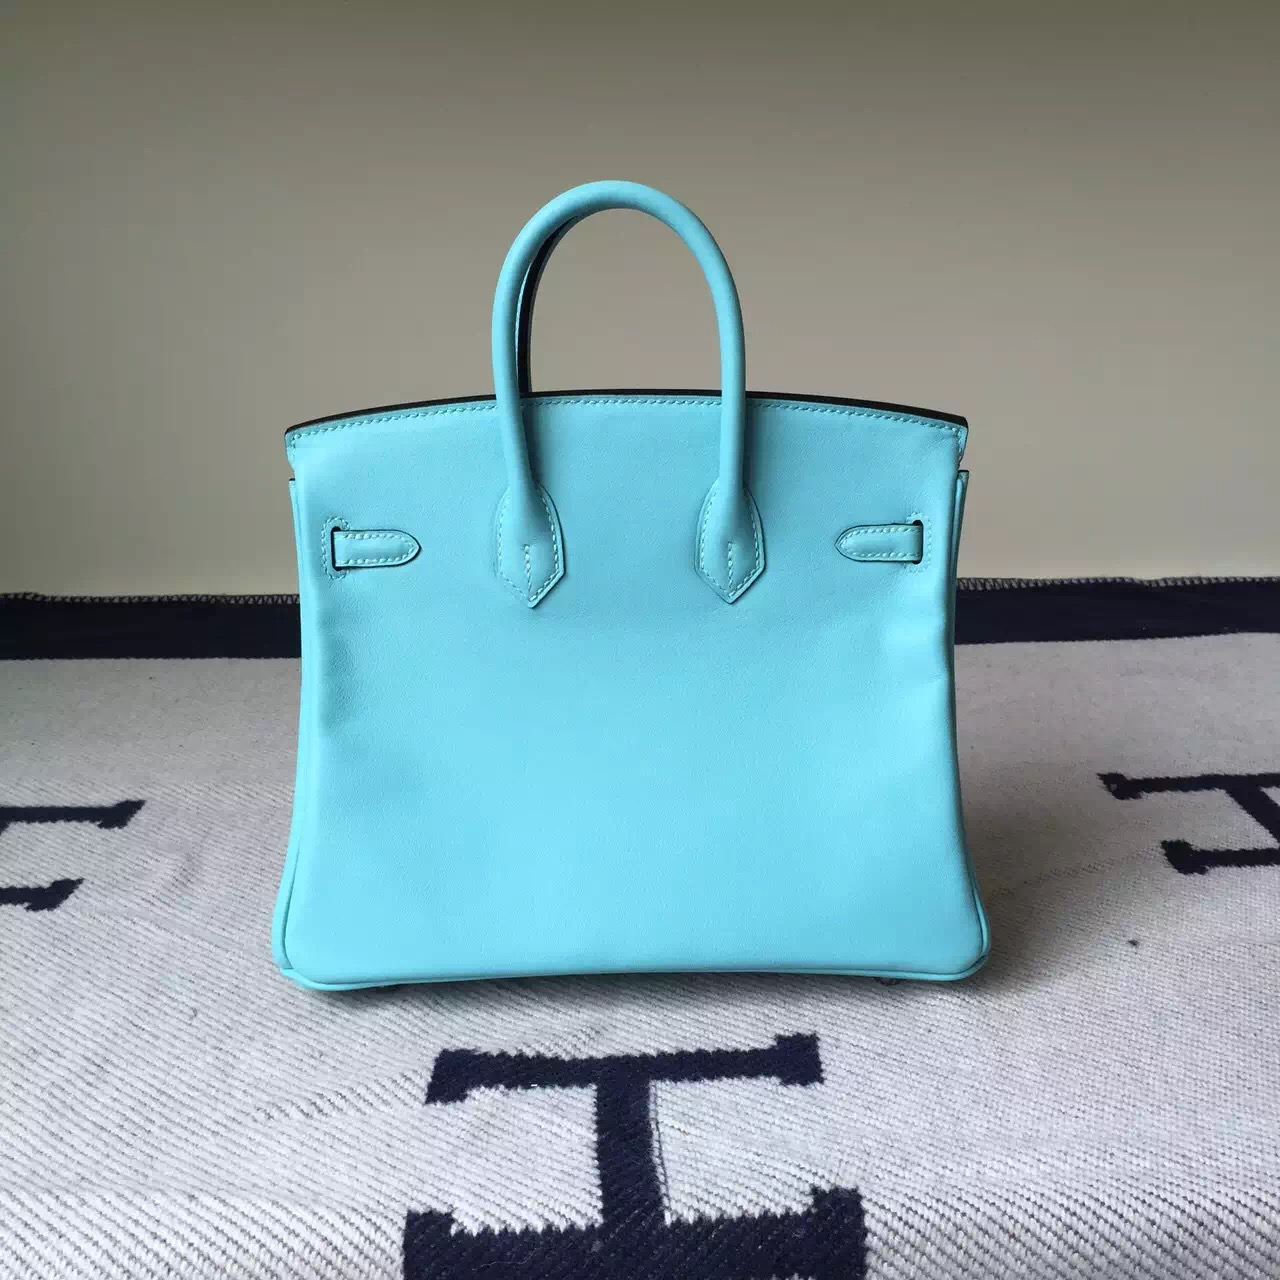 Wholesale Hermes Swift Leather Birkin25cm Bag in 3P Lagon Blue